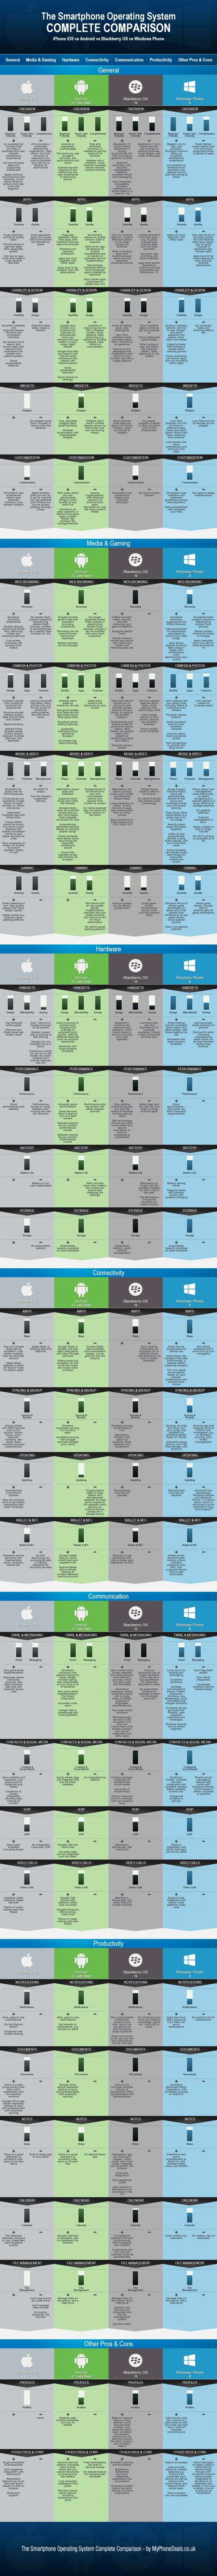 Smartphone comparison infographic Infographic